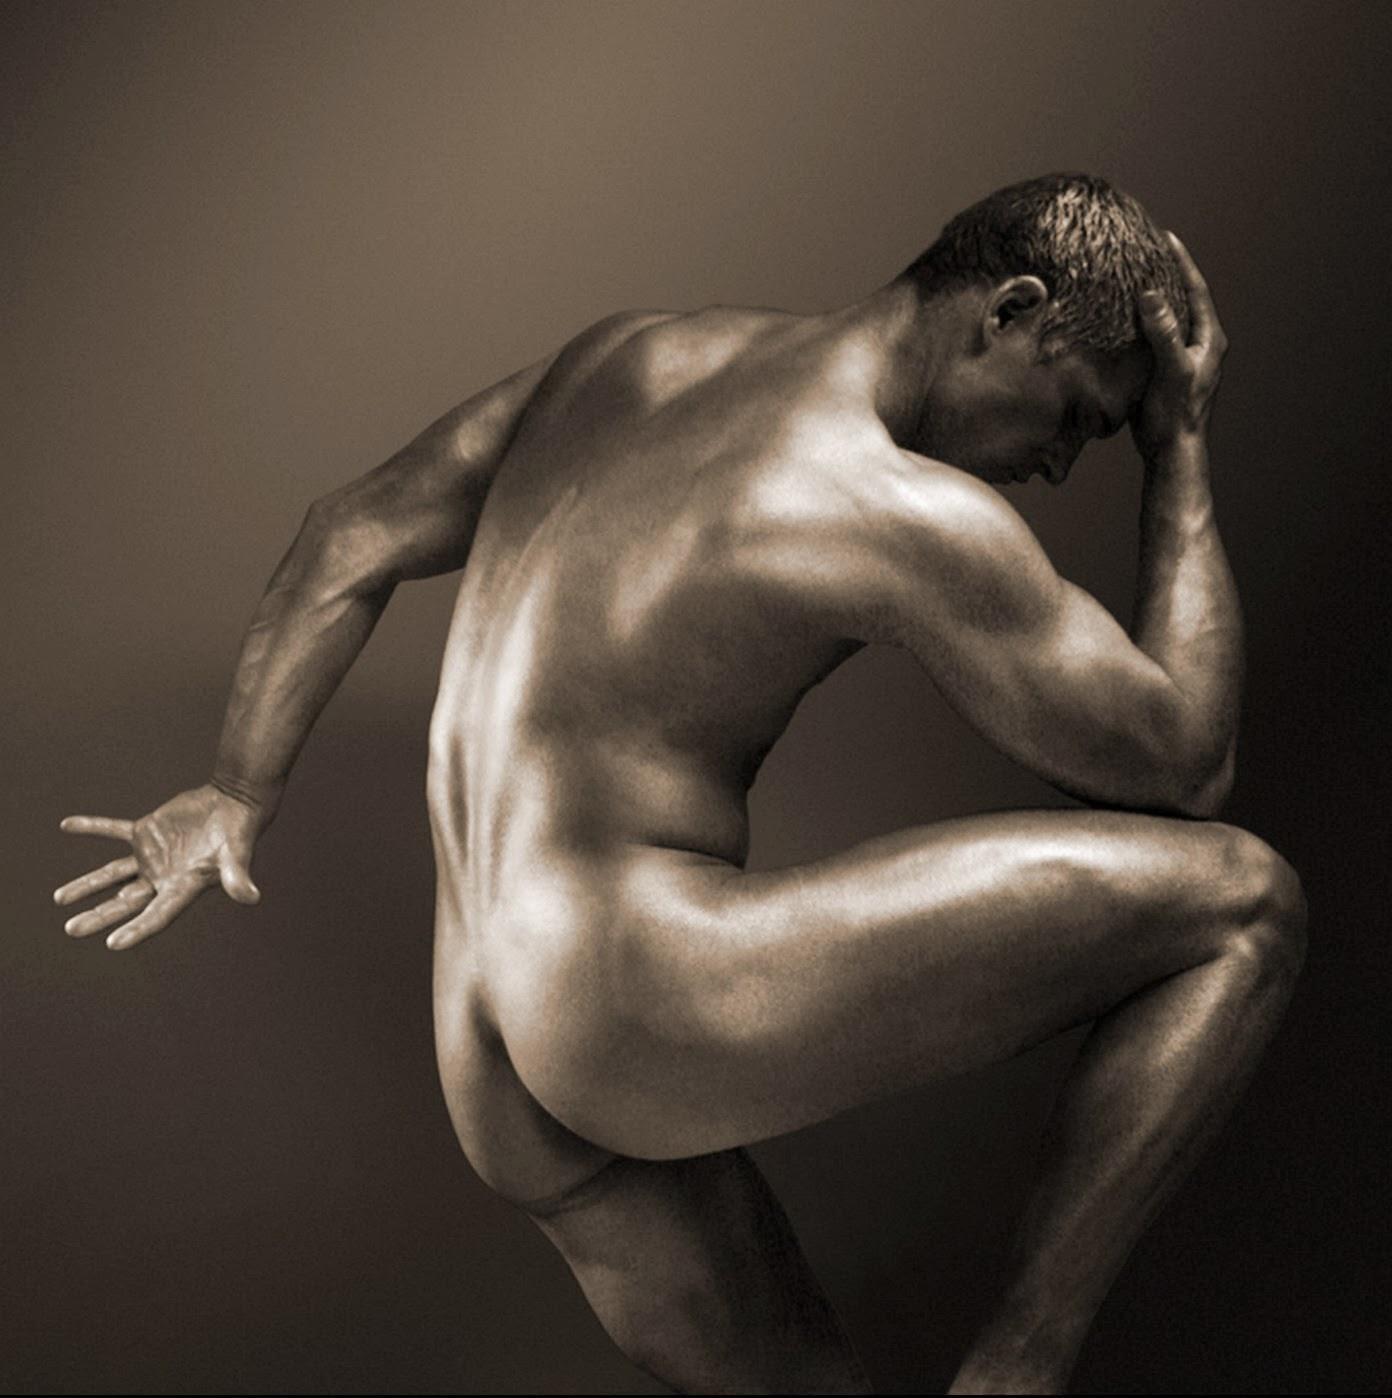 Modelos desnudos masculinos profesionales